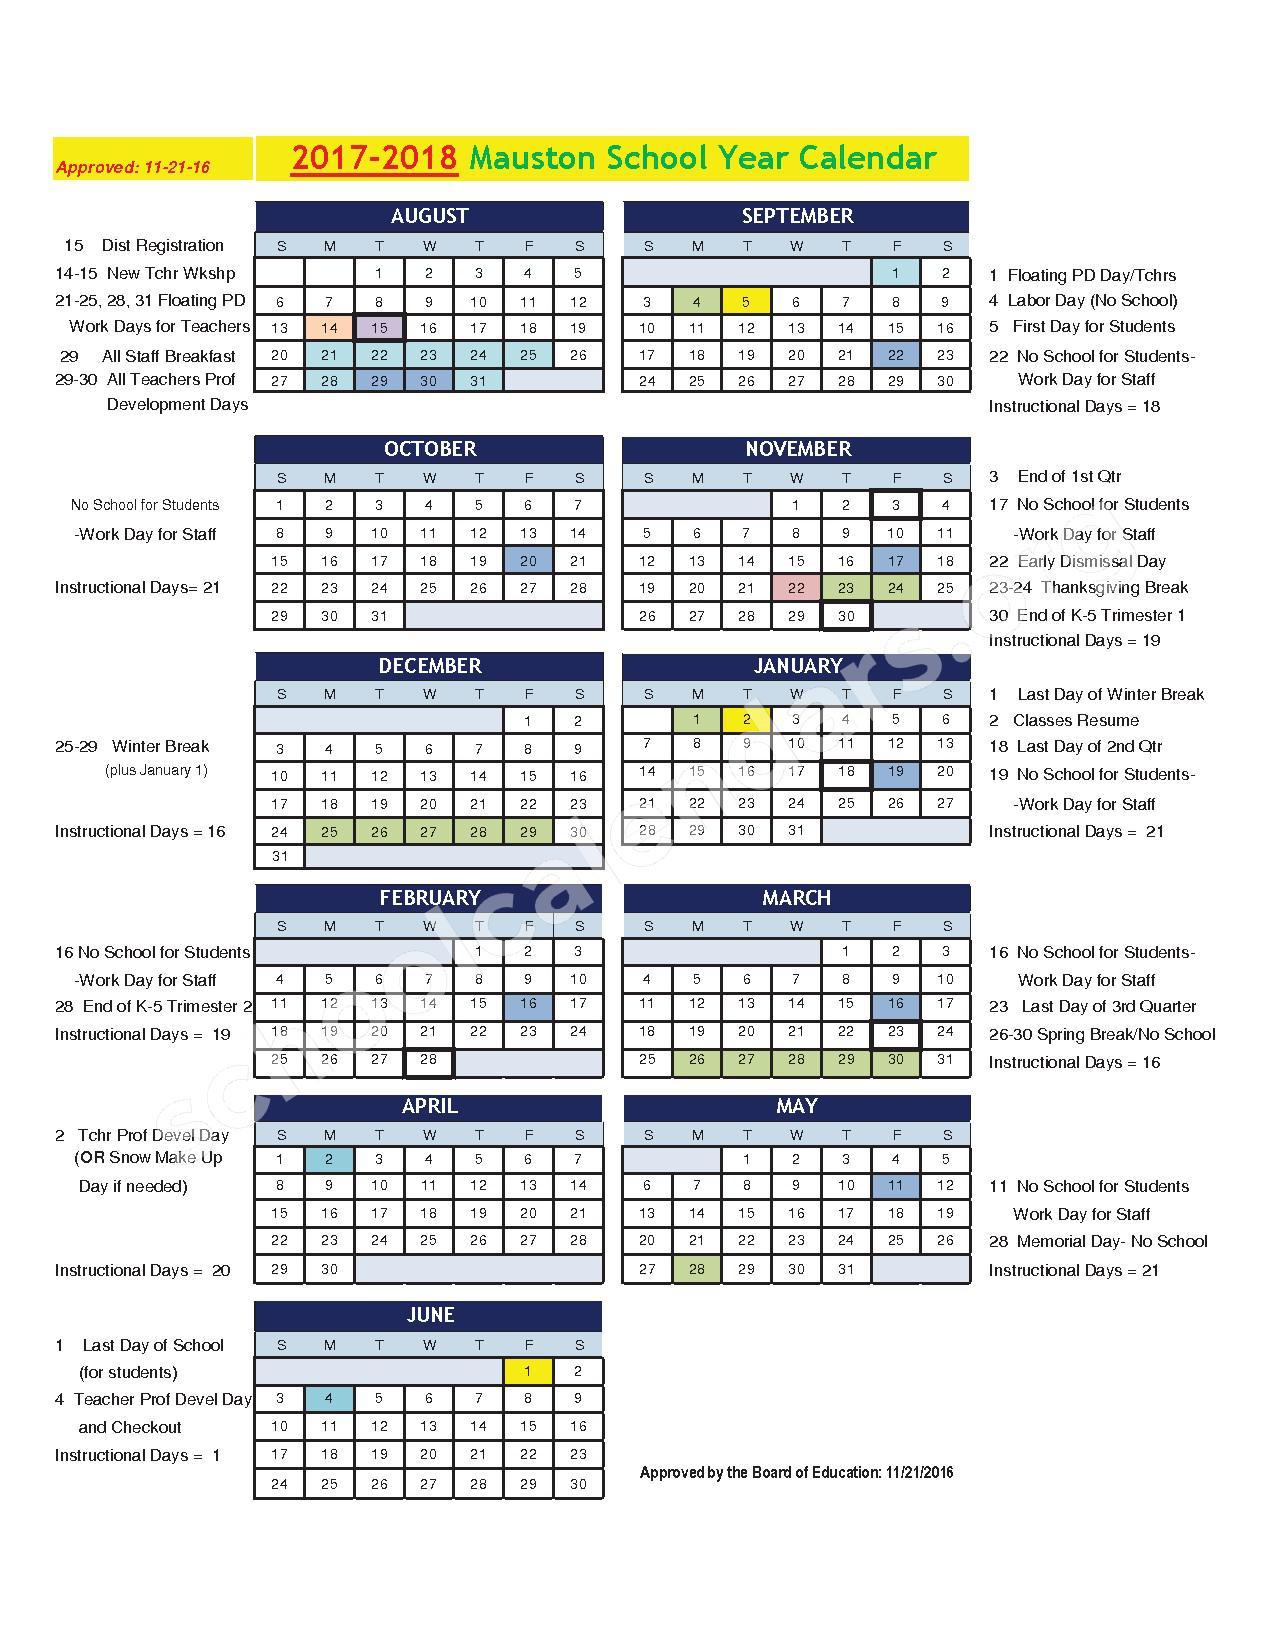 2017 - 2018 School Calendar – Mauston School District – page 1